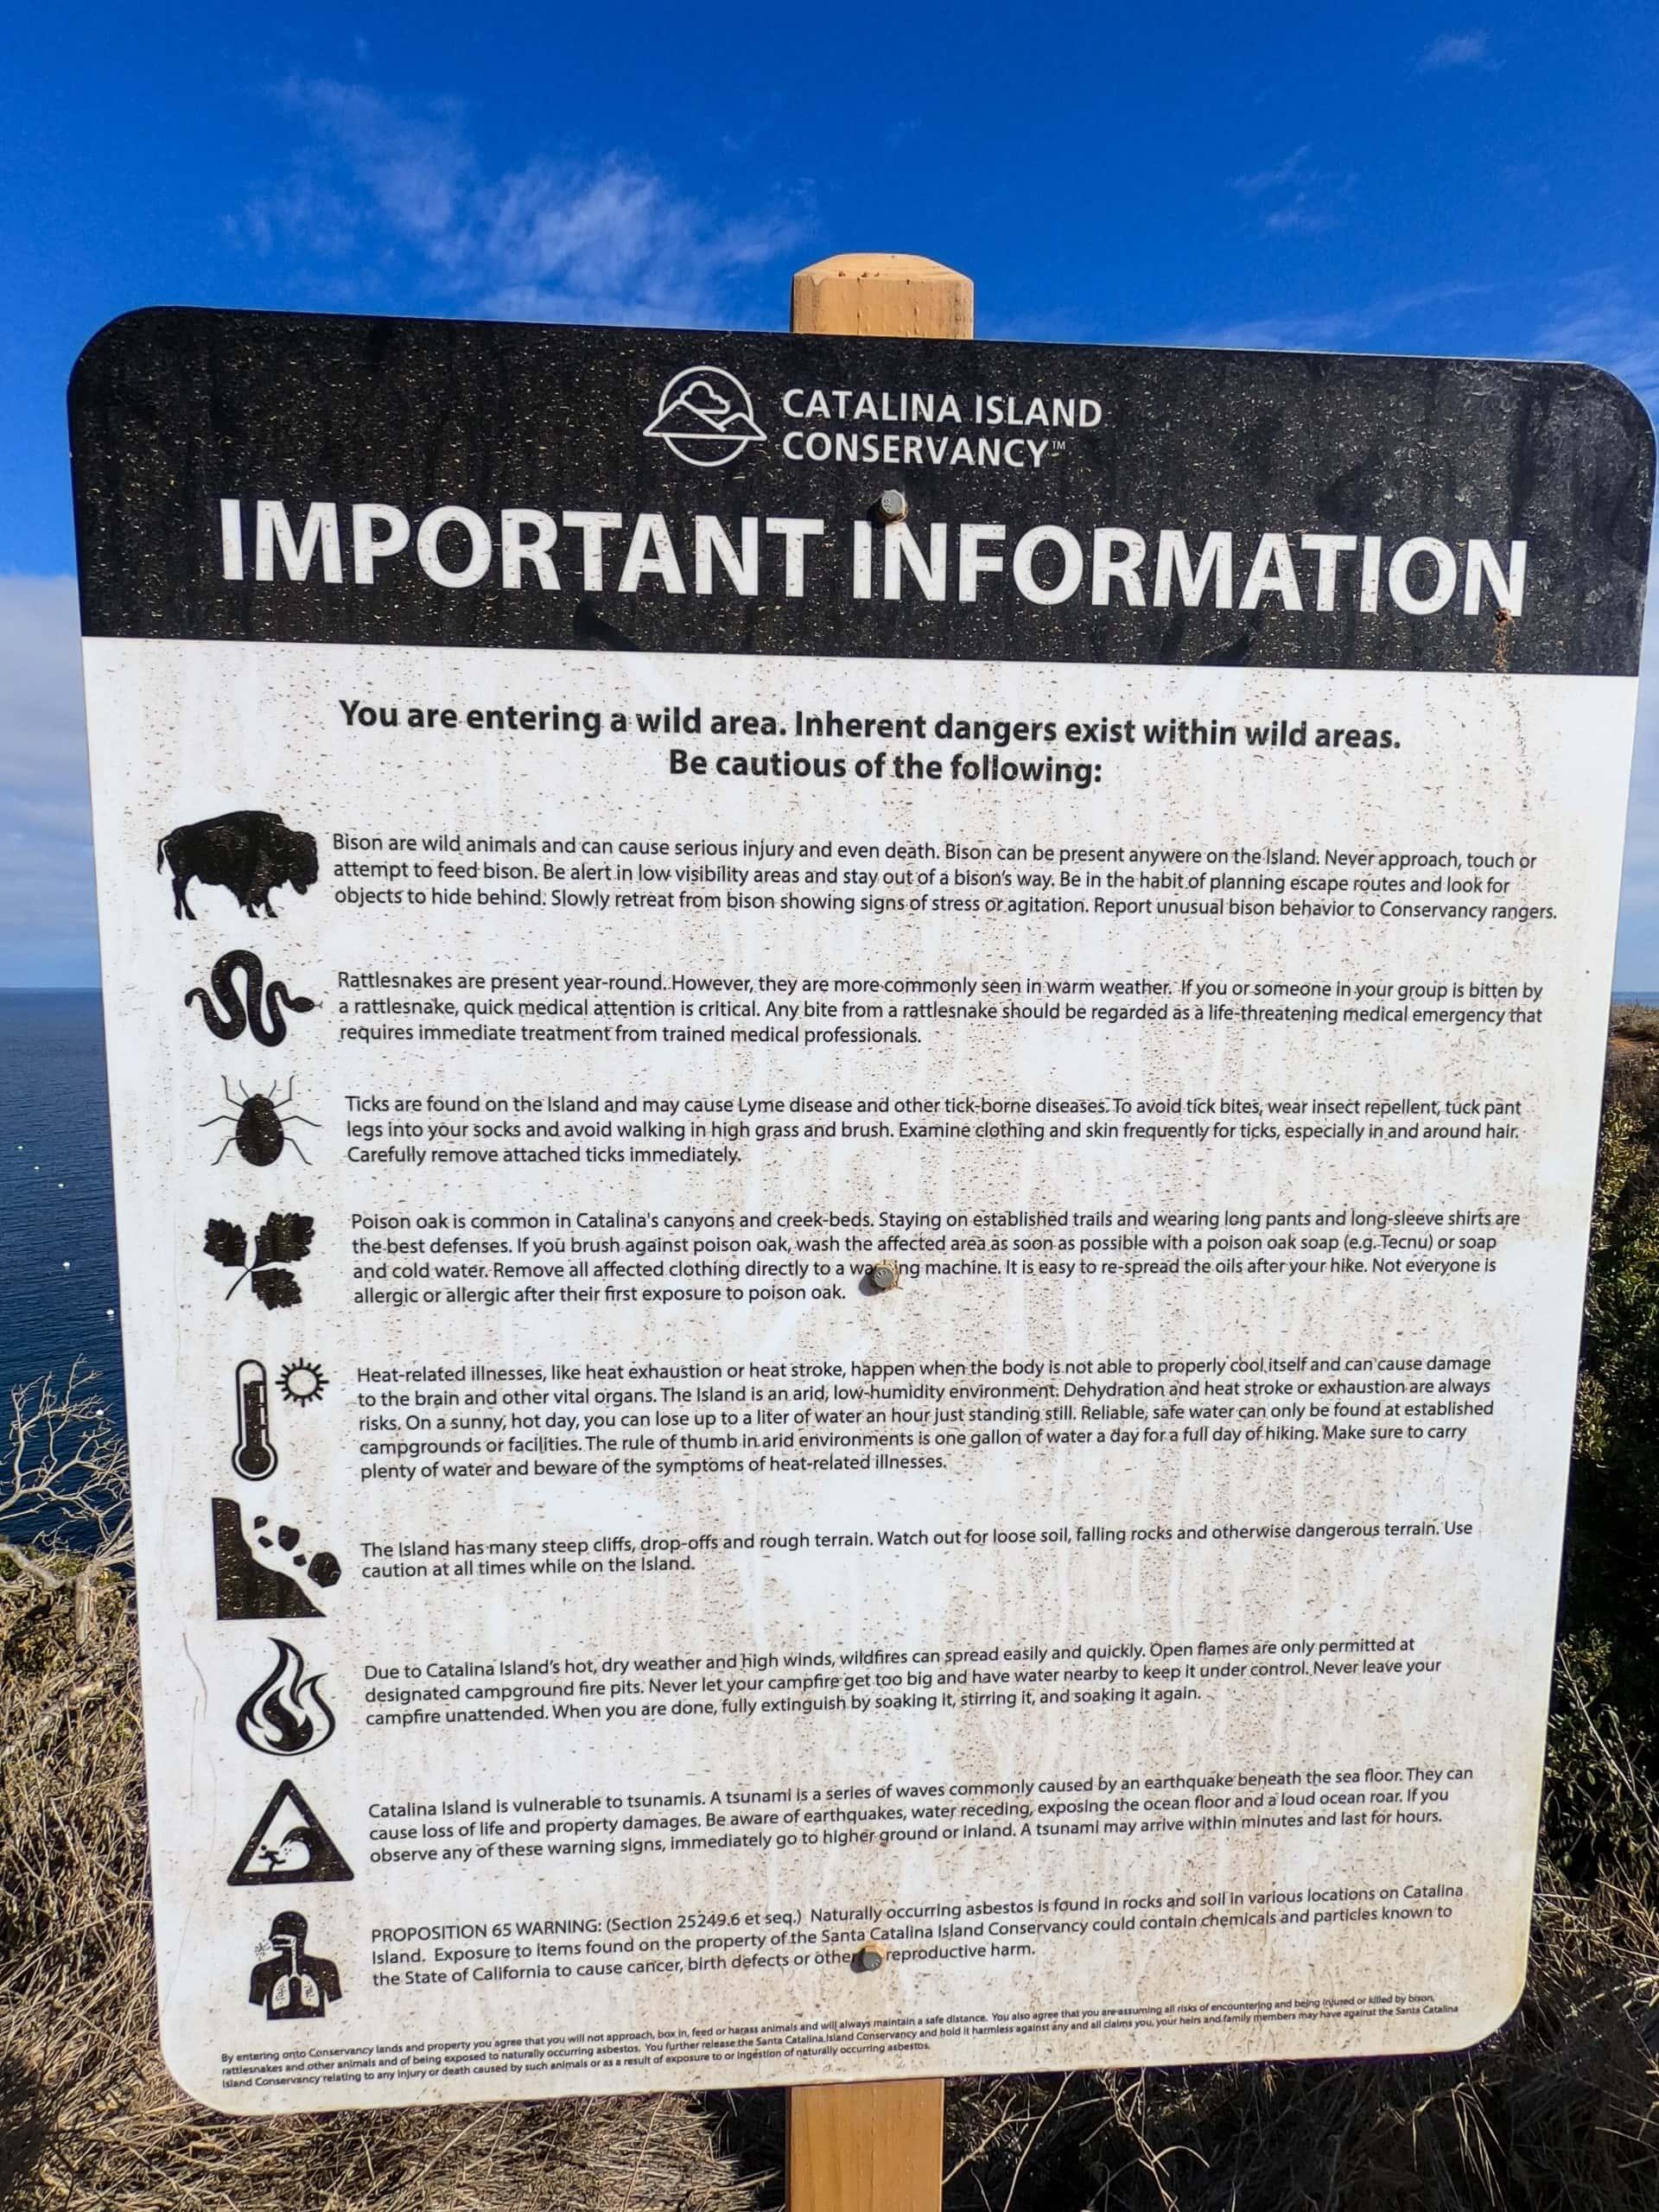 Tips for Catalina Island